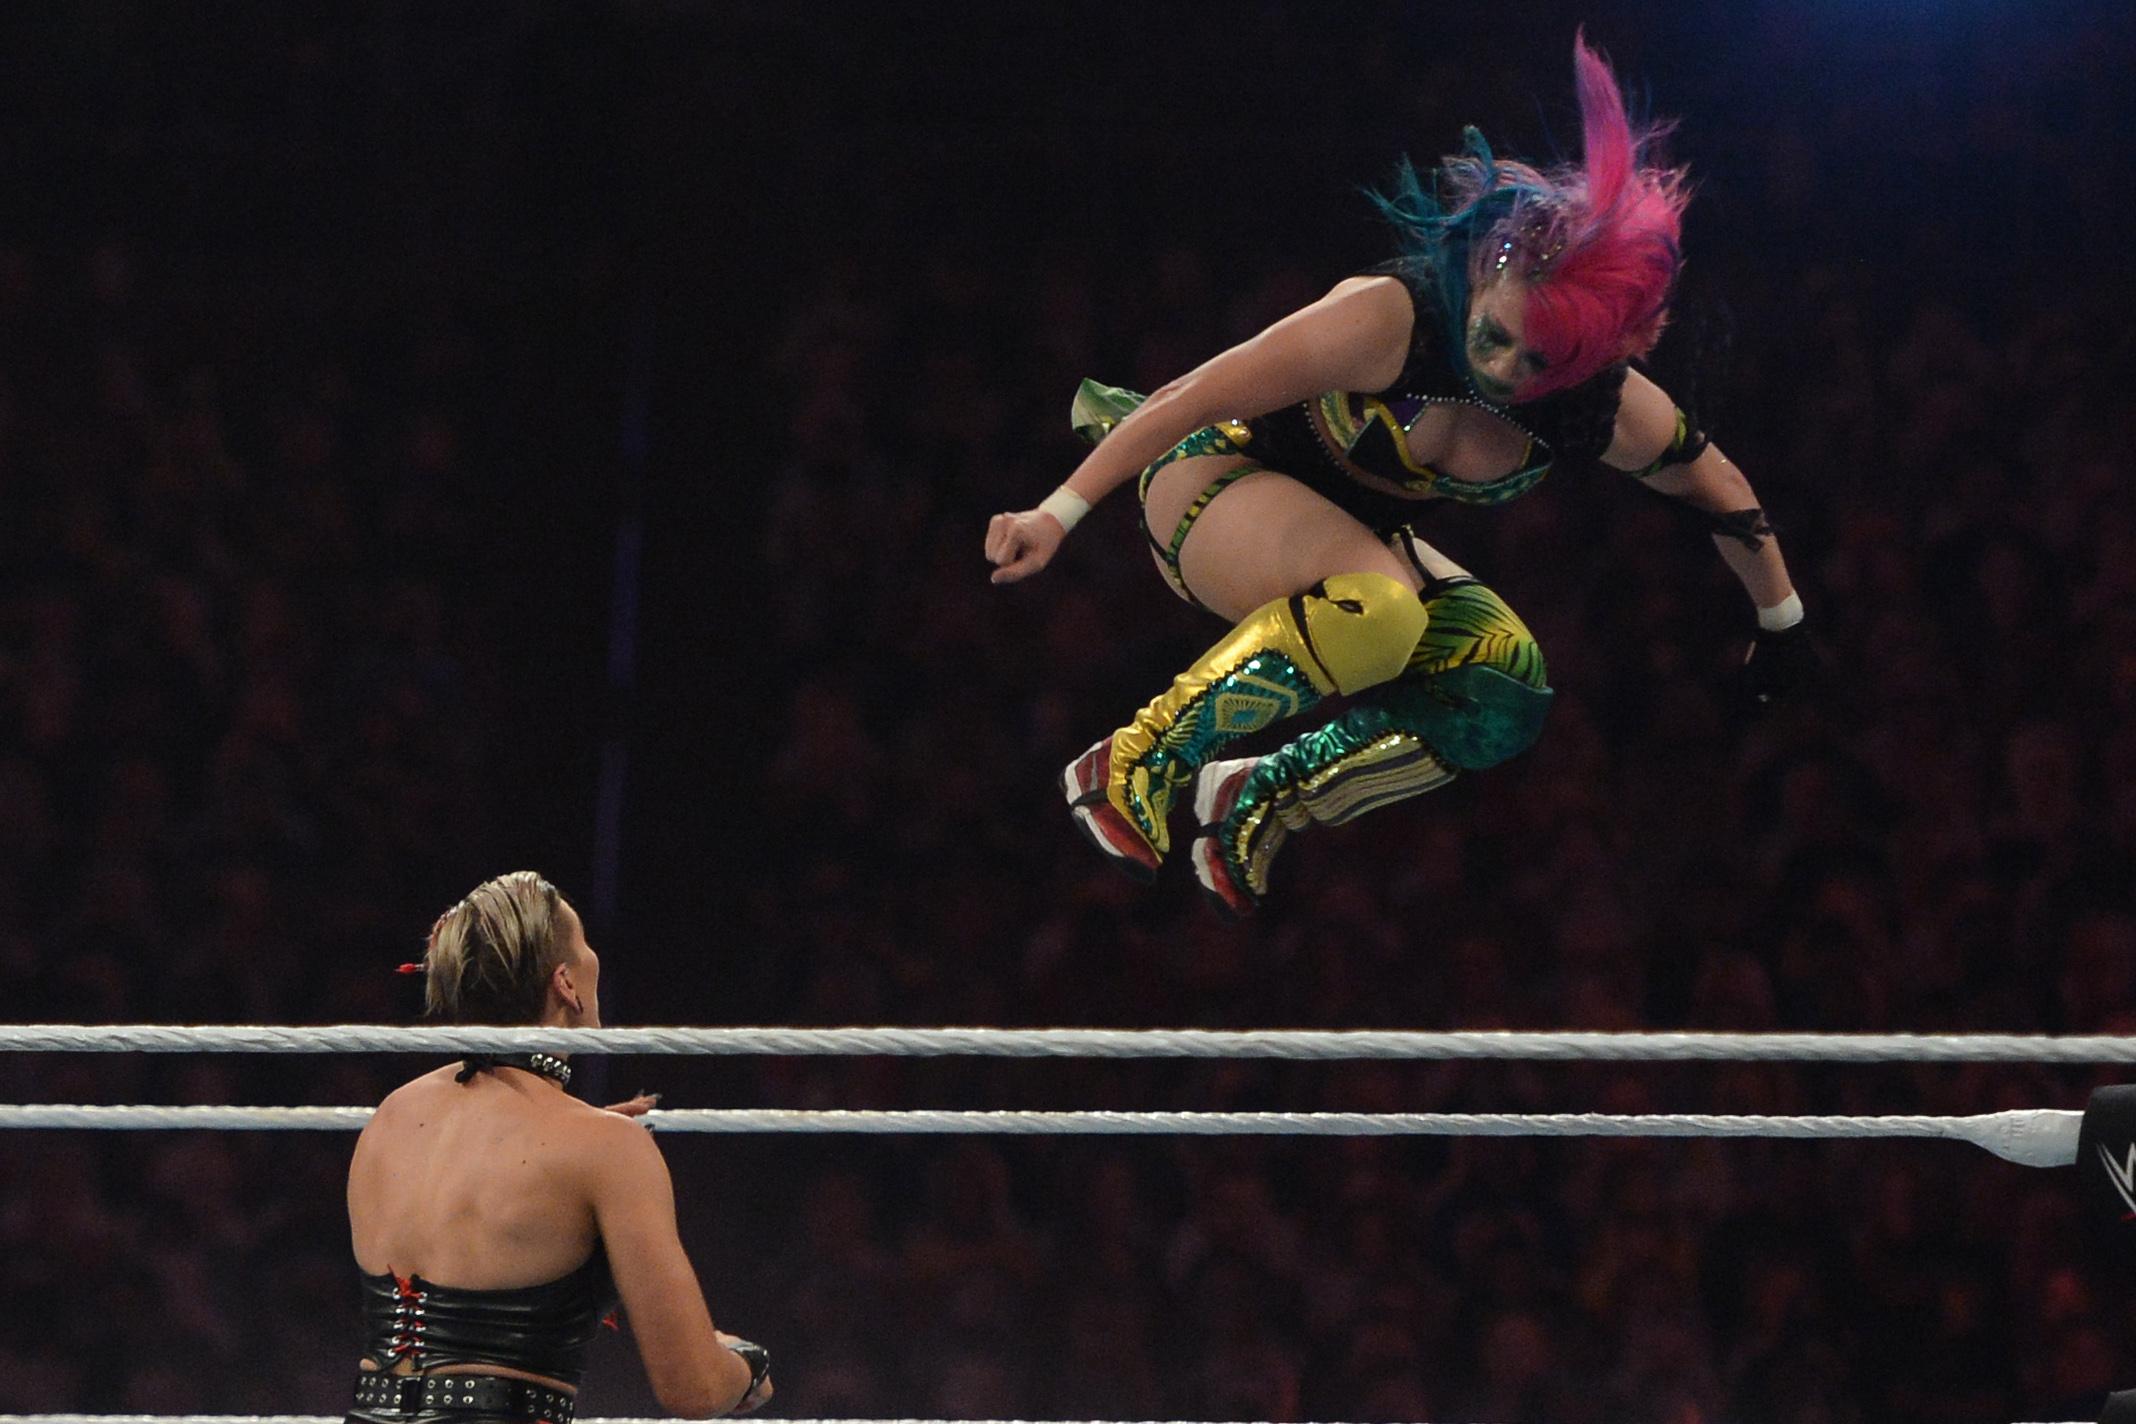 Wrestling: WWE WrestleMania 37